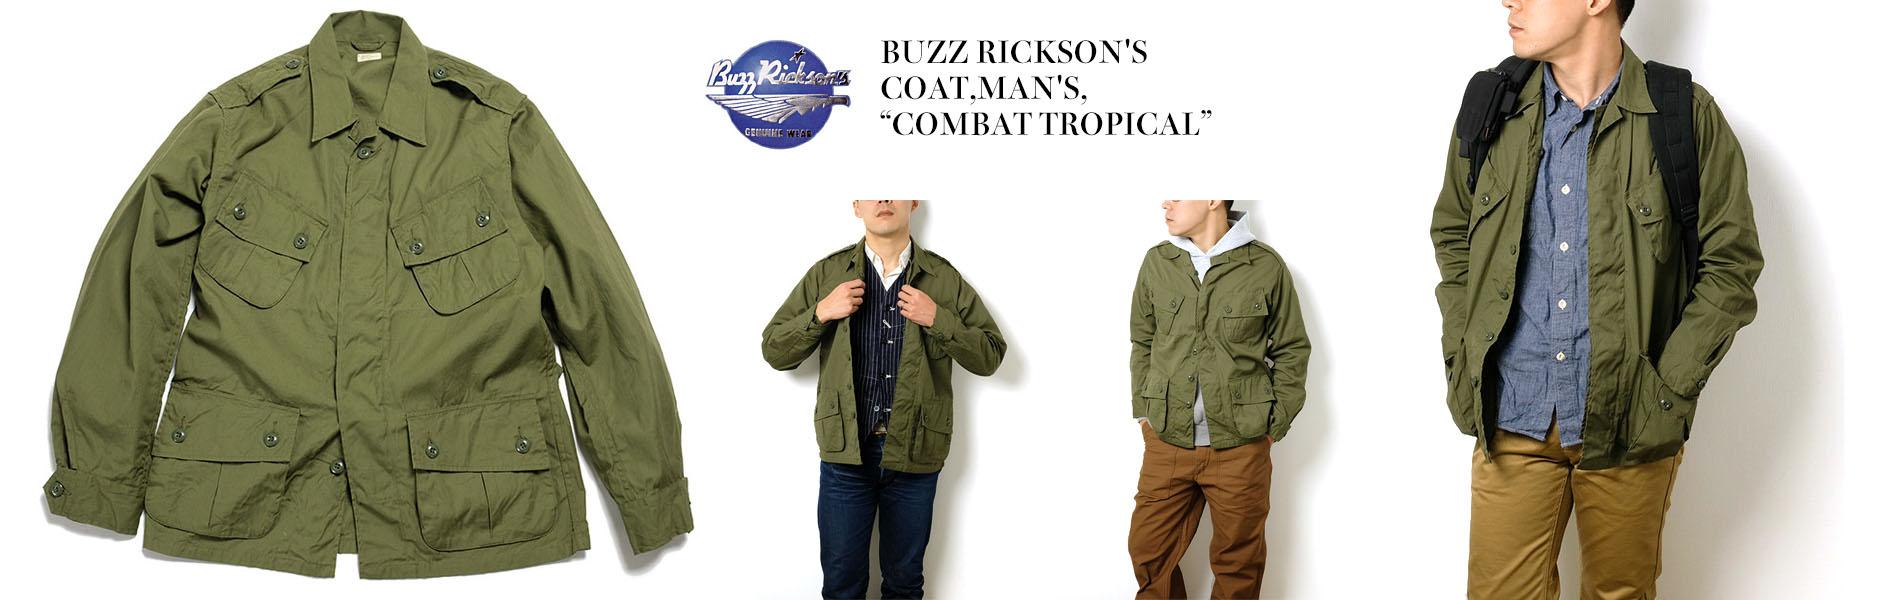 Buzz Rickson's Combat Tropical